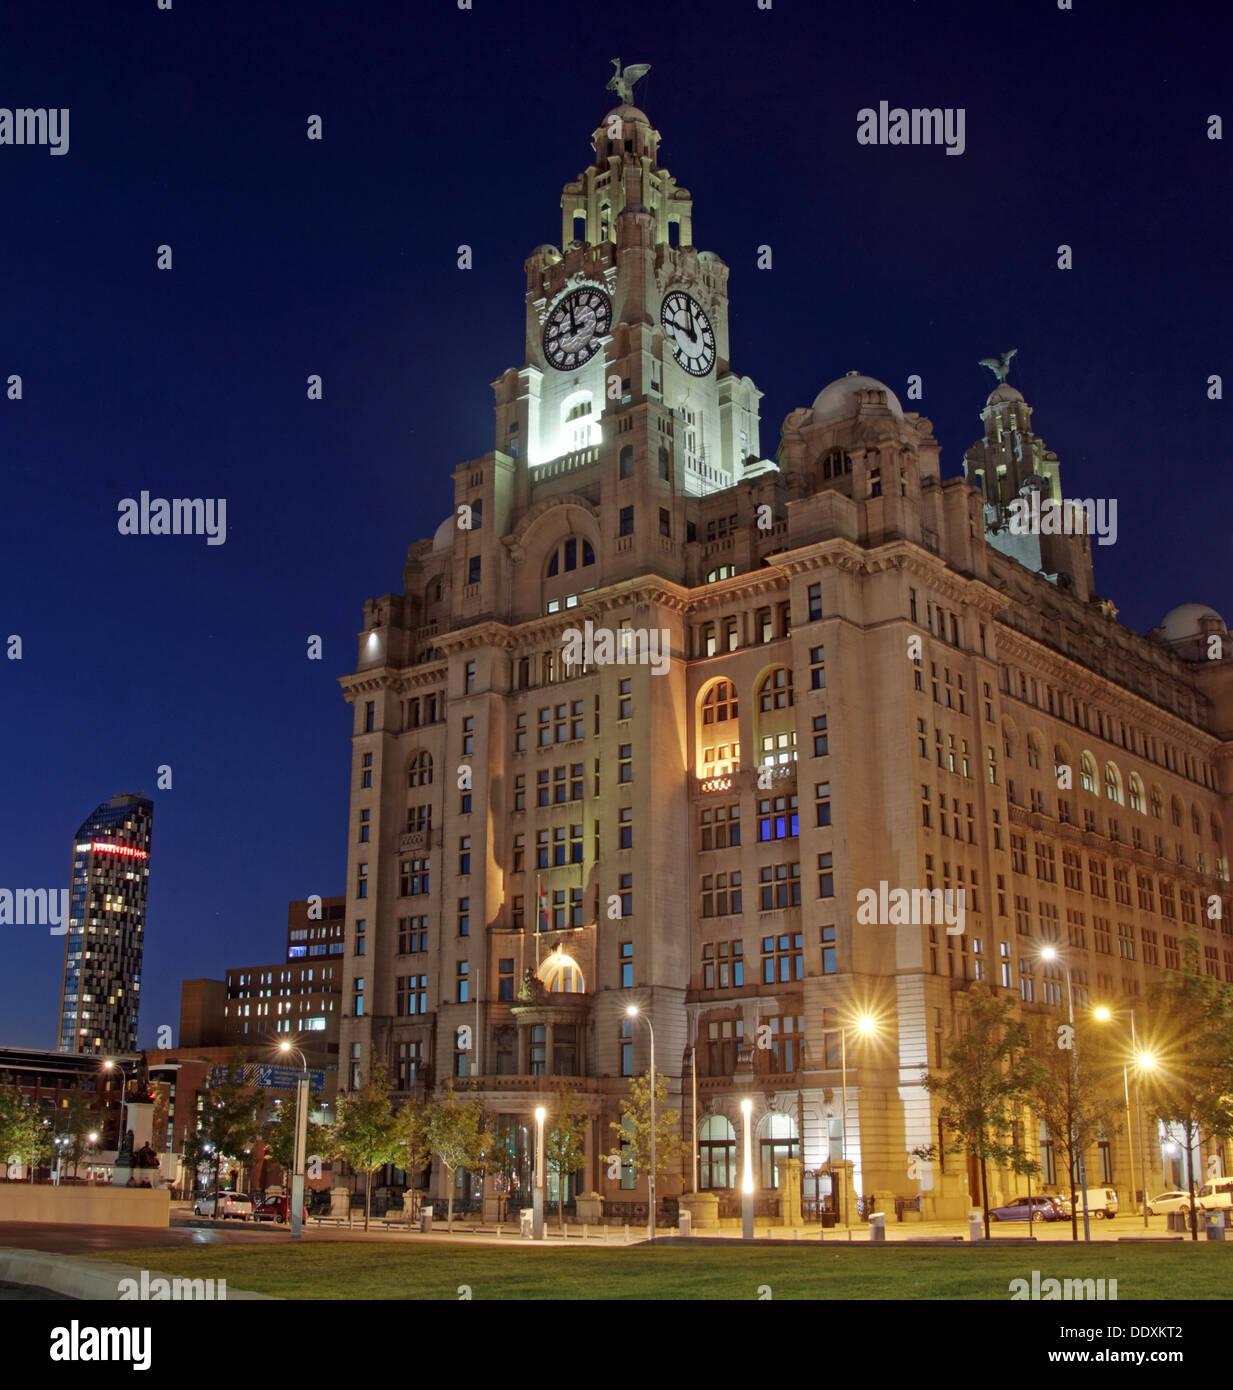 Pier Head Liver Building at dusk Liverpool Merseyside England UK - Stock Image